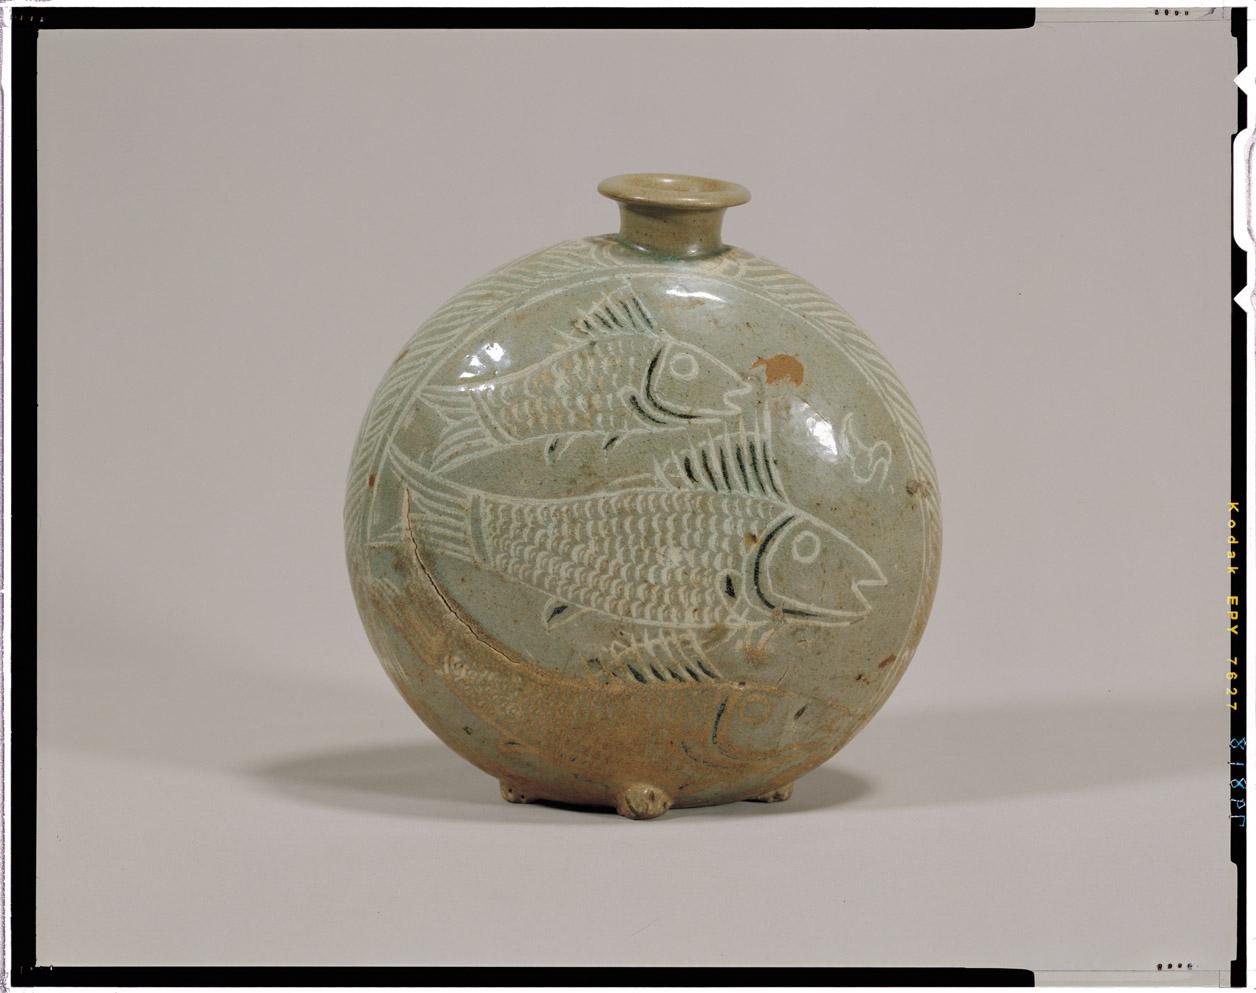 zh 粉青象嵌魚文扁壺 朝鮮半島の古陶磁 15c